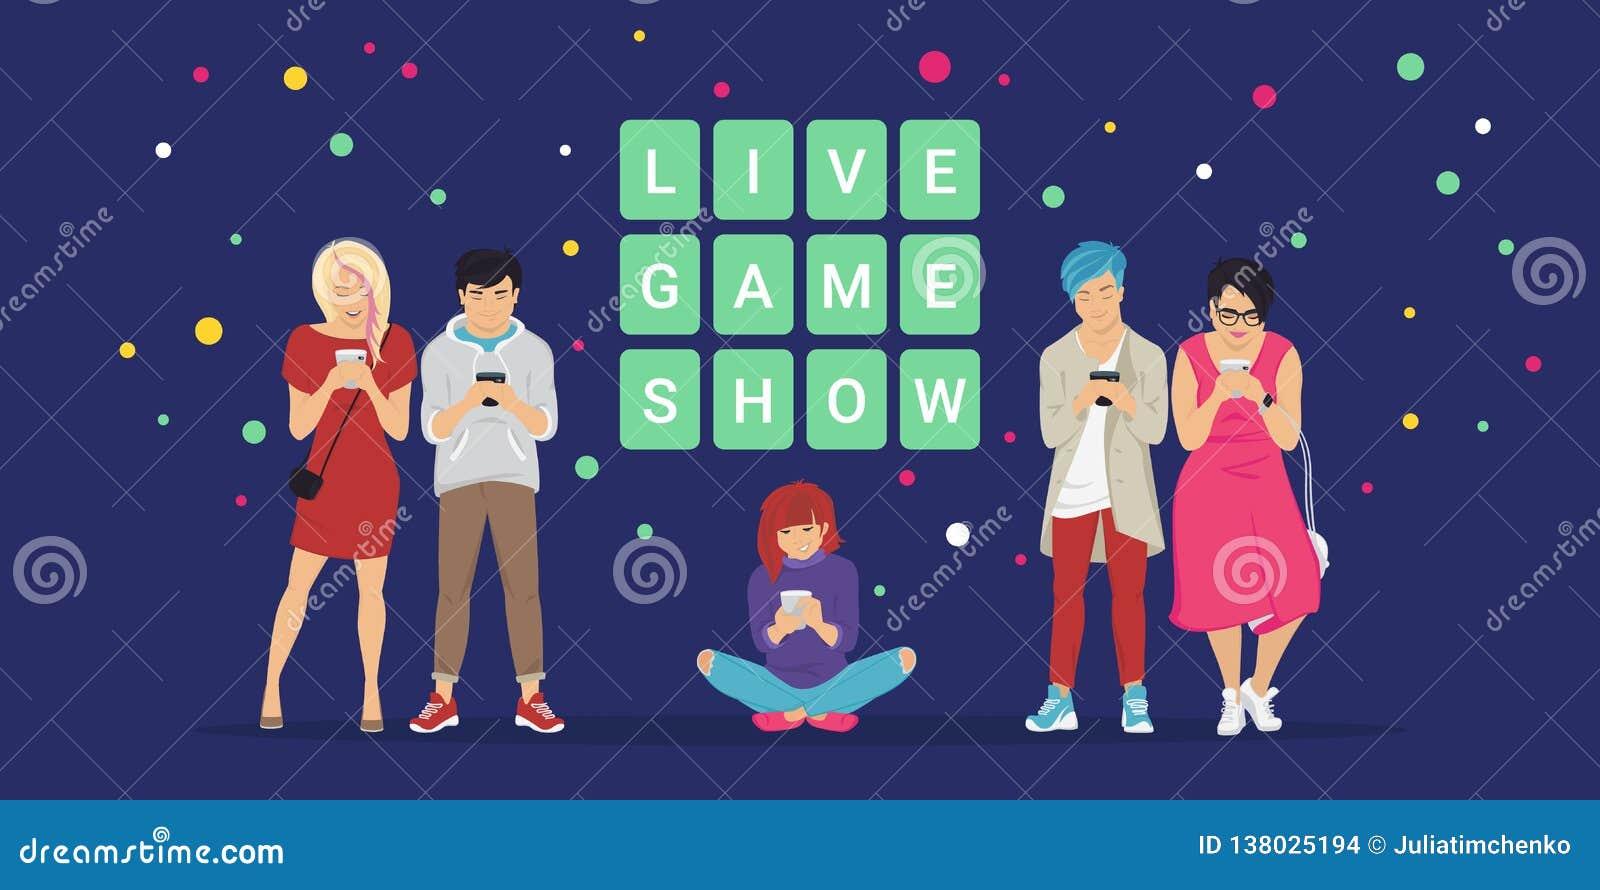 Live Game Show Mobile App Concept Flat Vector Illustration